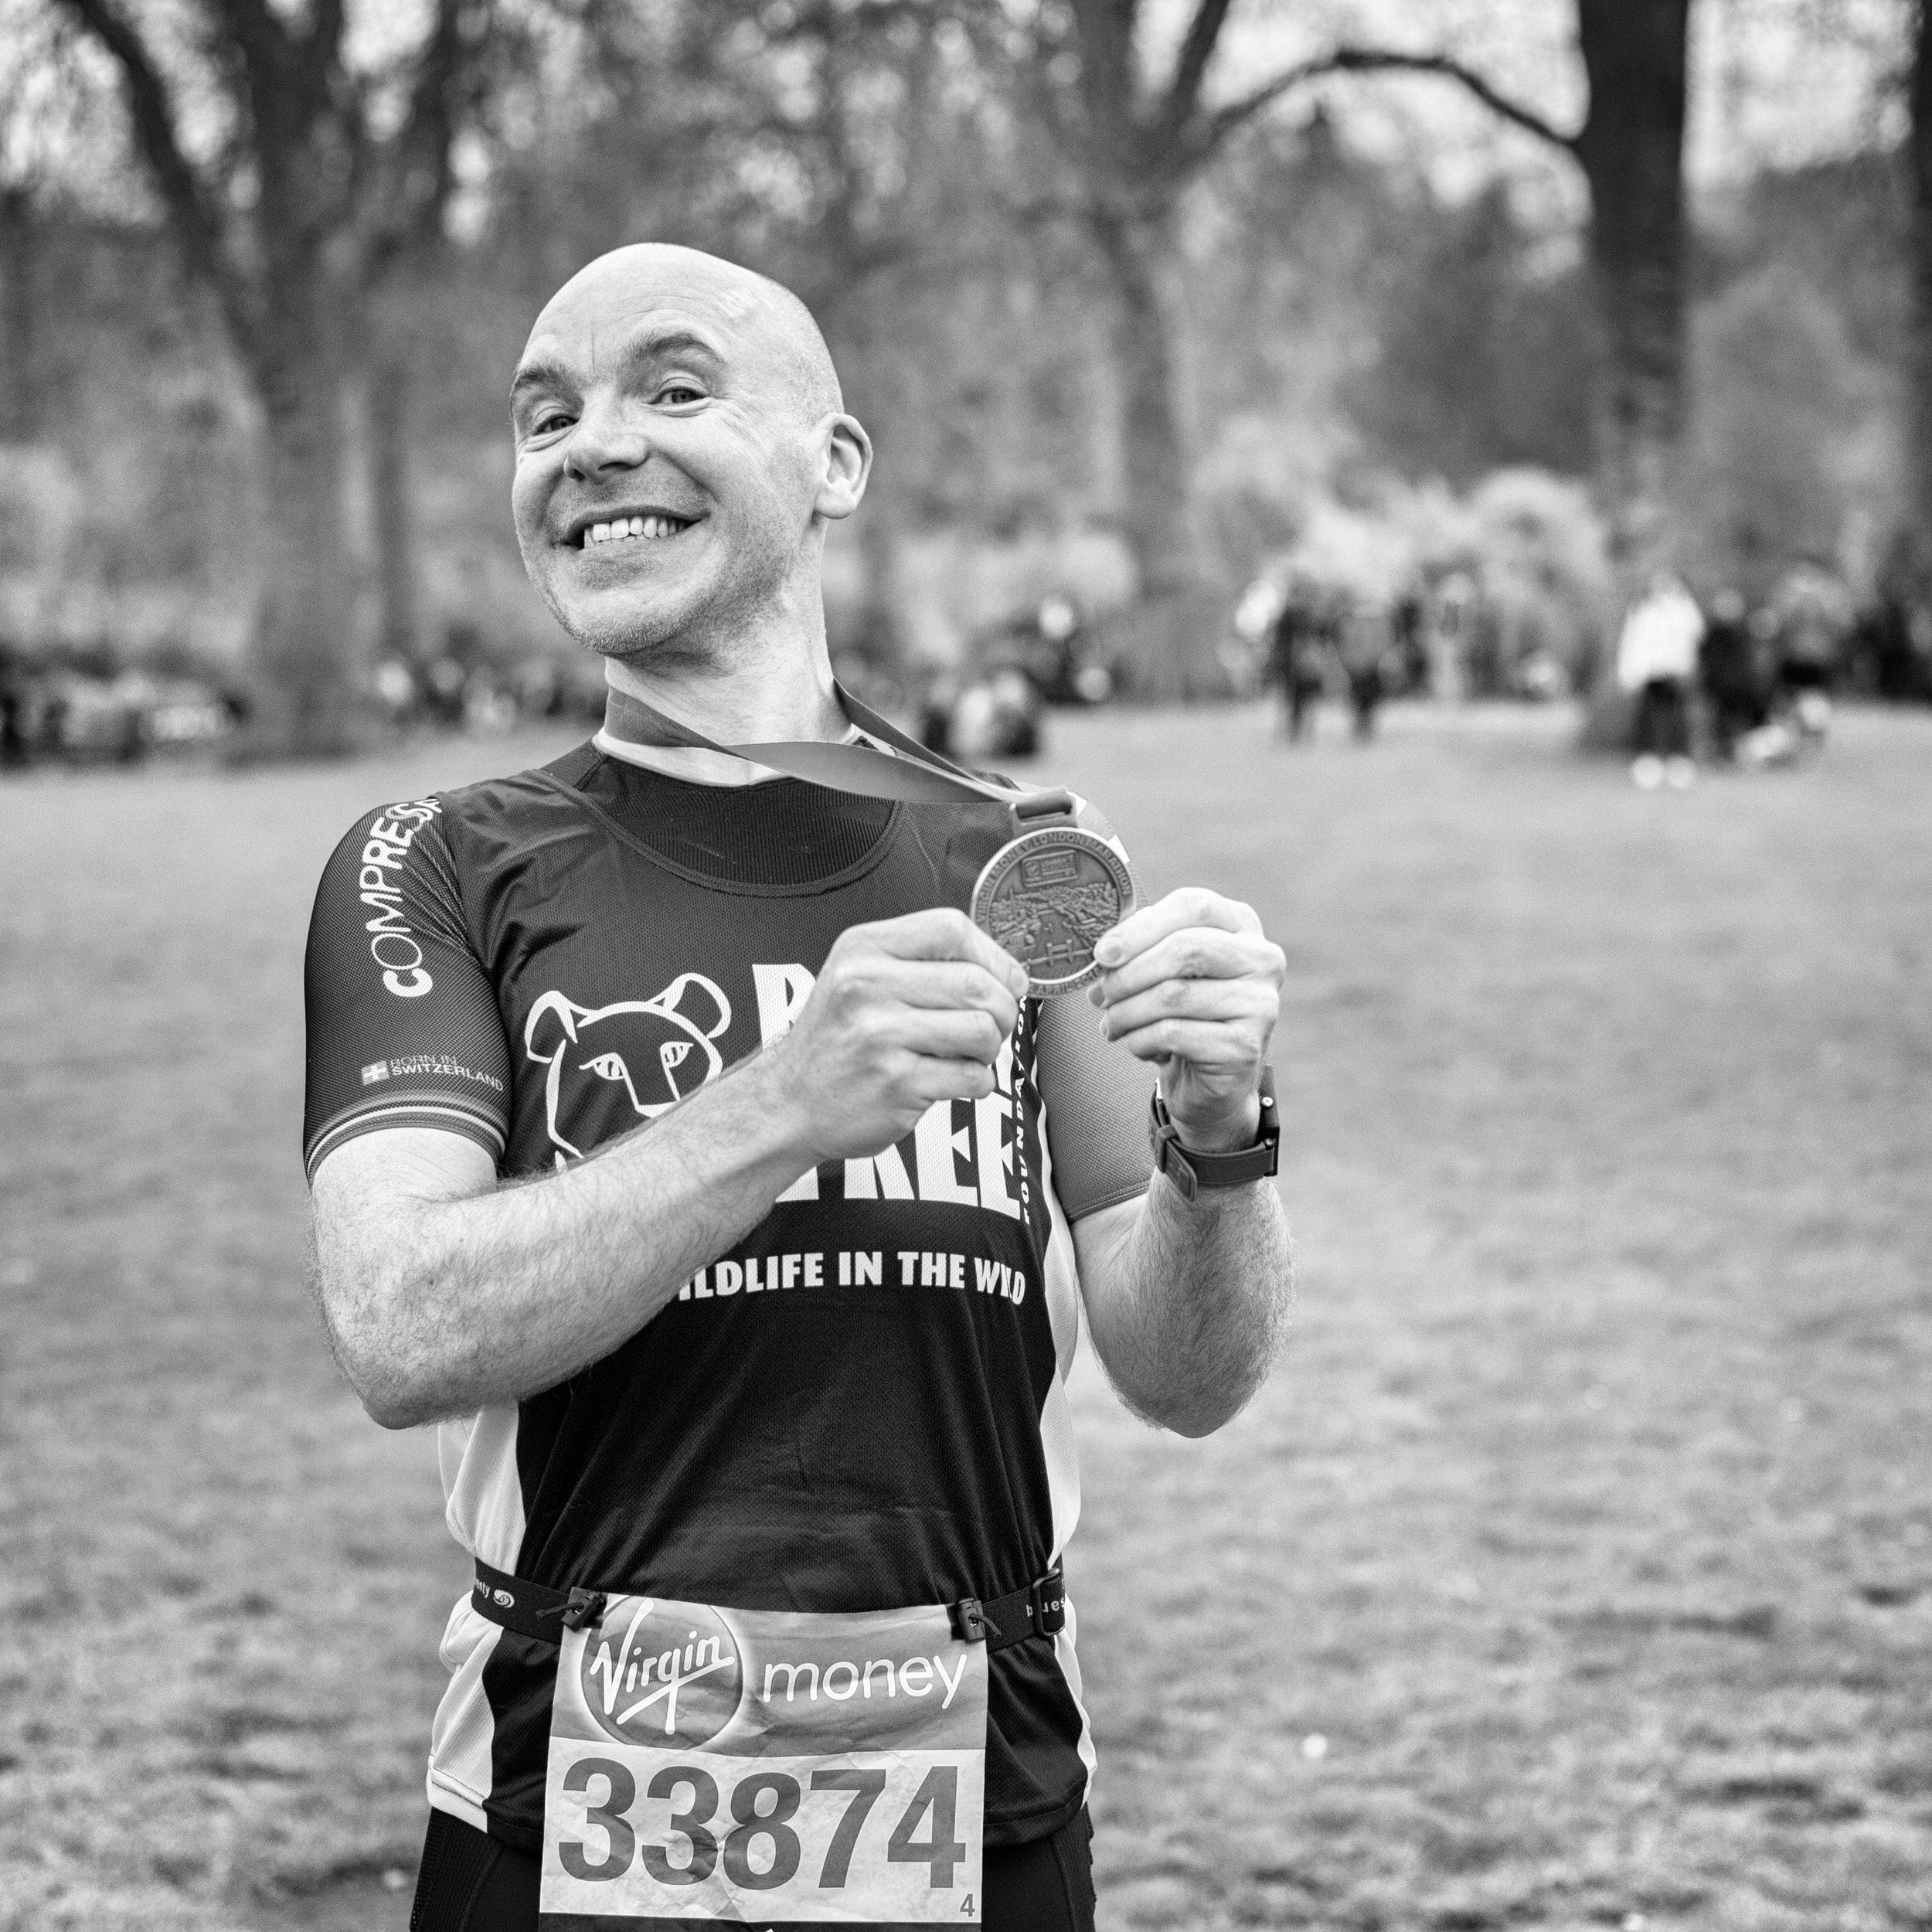 London marathon 2016 Aniko Towers  Photo-24.jpg